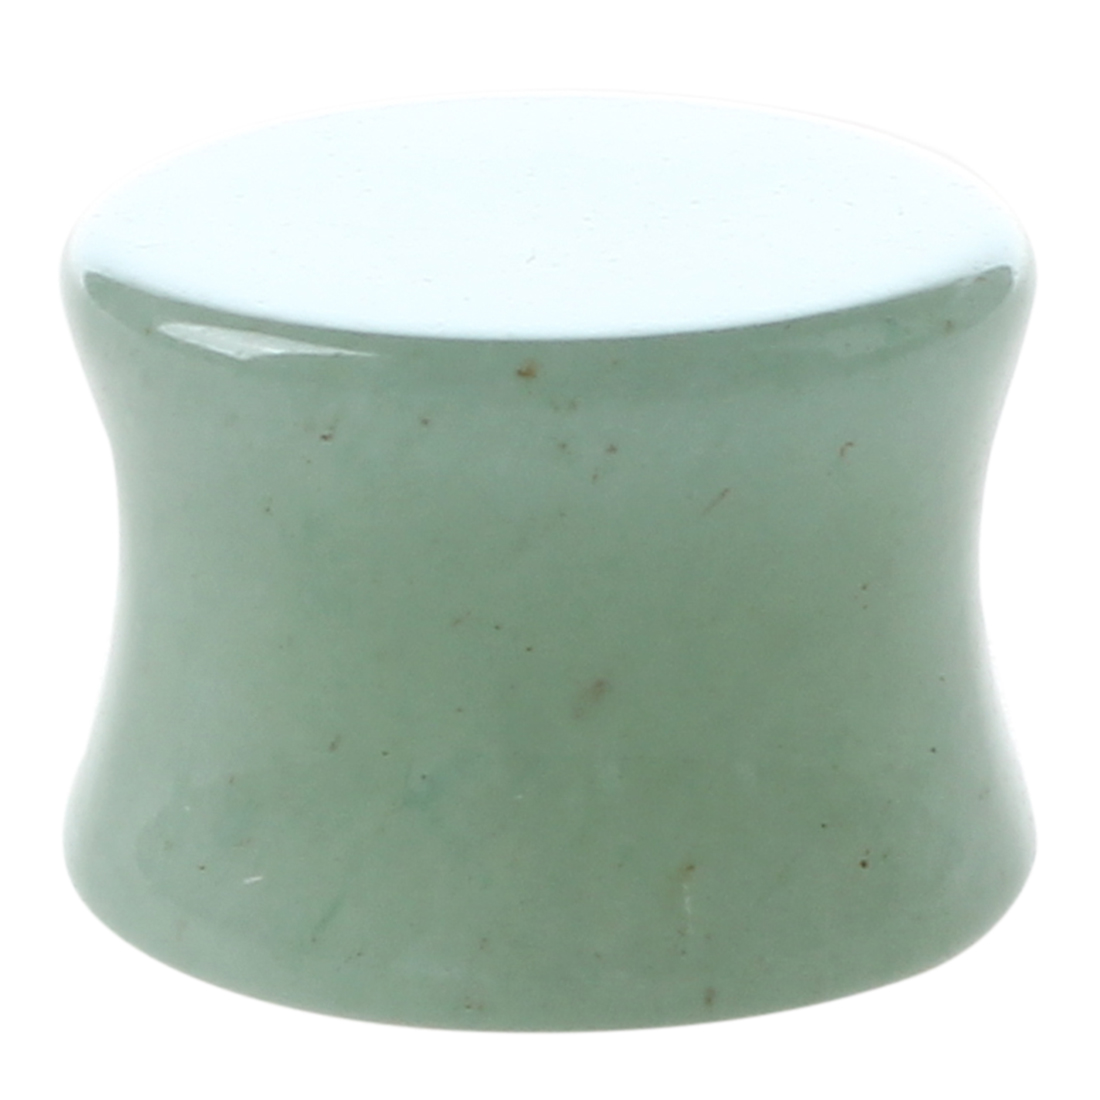 1-Pair-of-Solid-Jade-Stone-Organic-Ear-Plugs-Gauges-Rings-Tunnels-Piercing-Y1X6 thumbnail 4